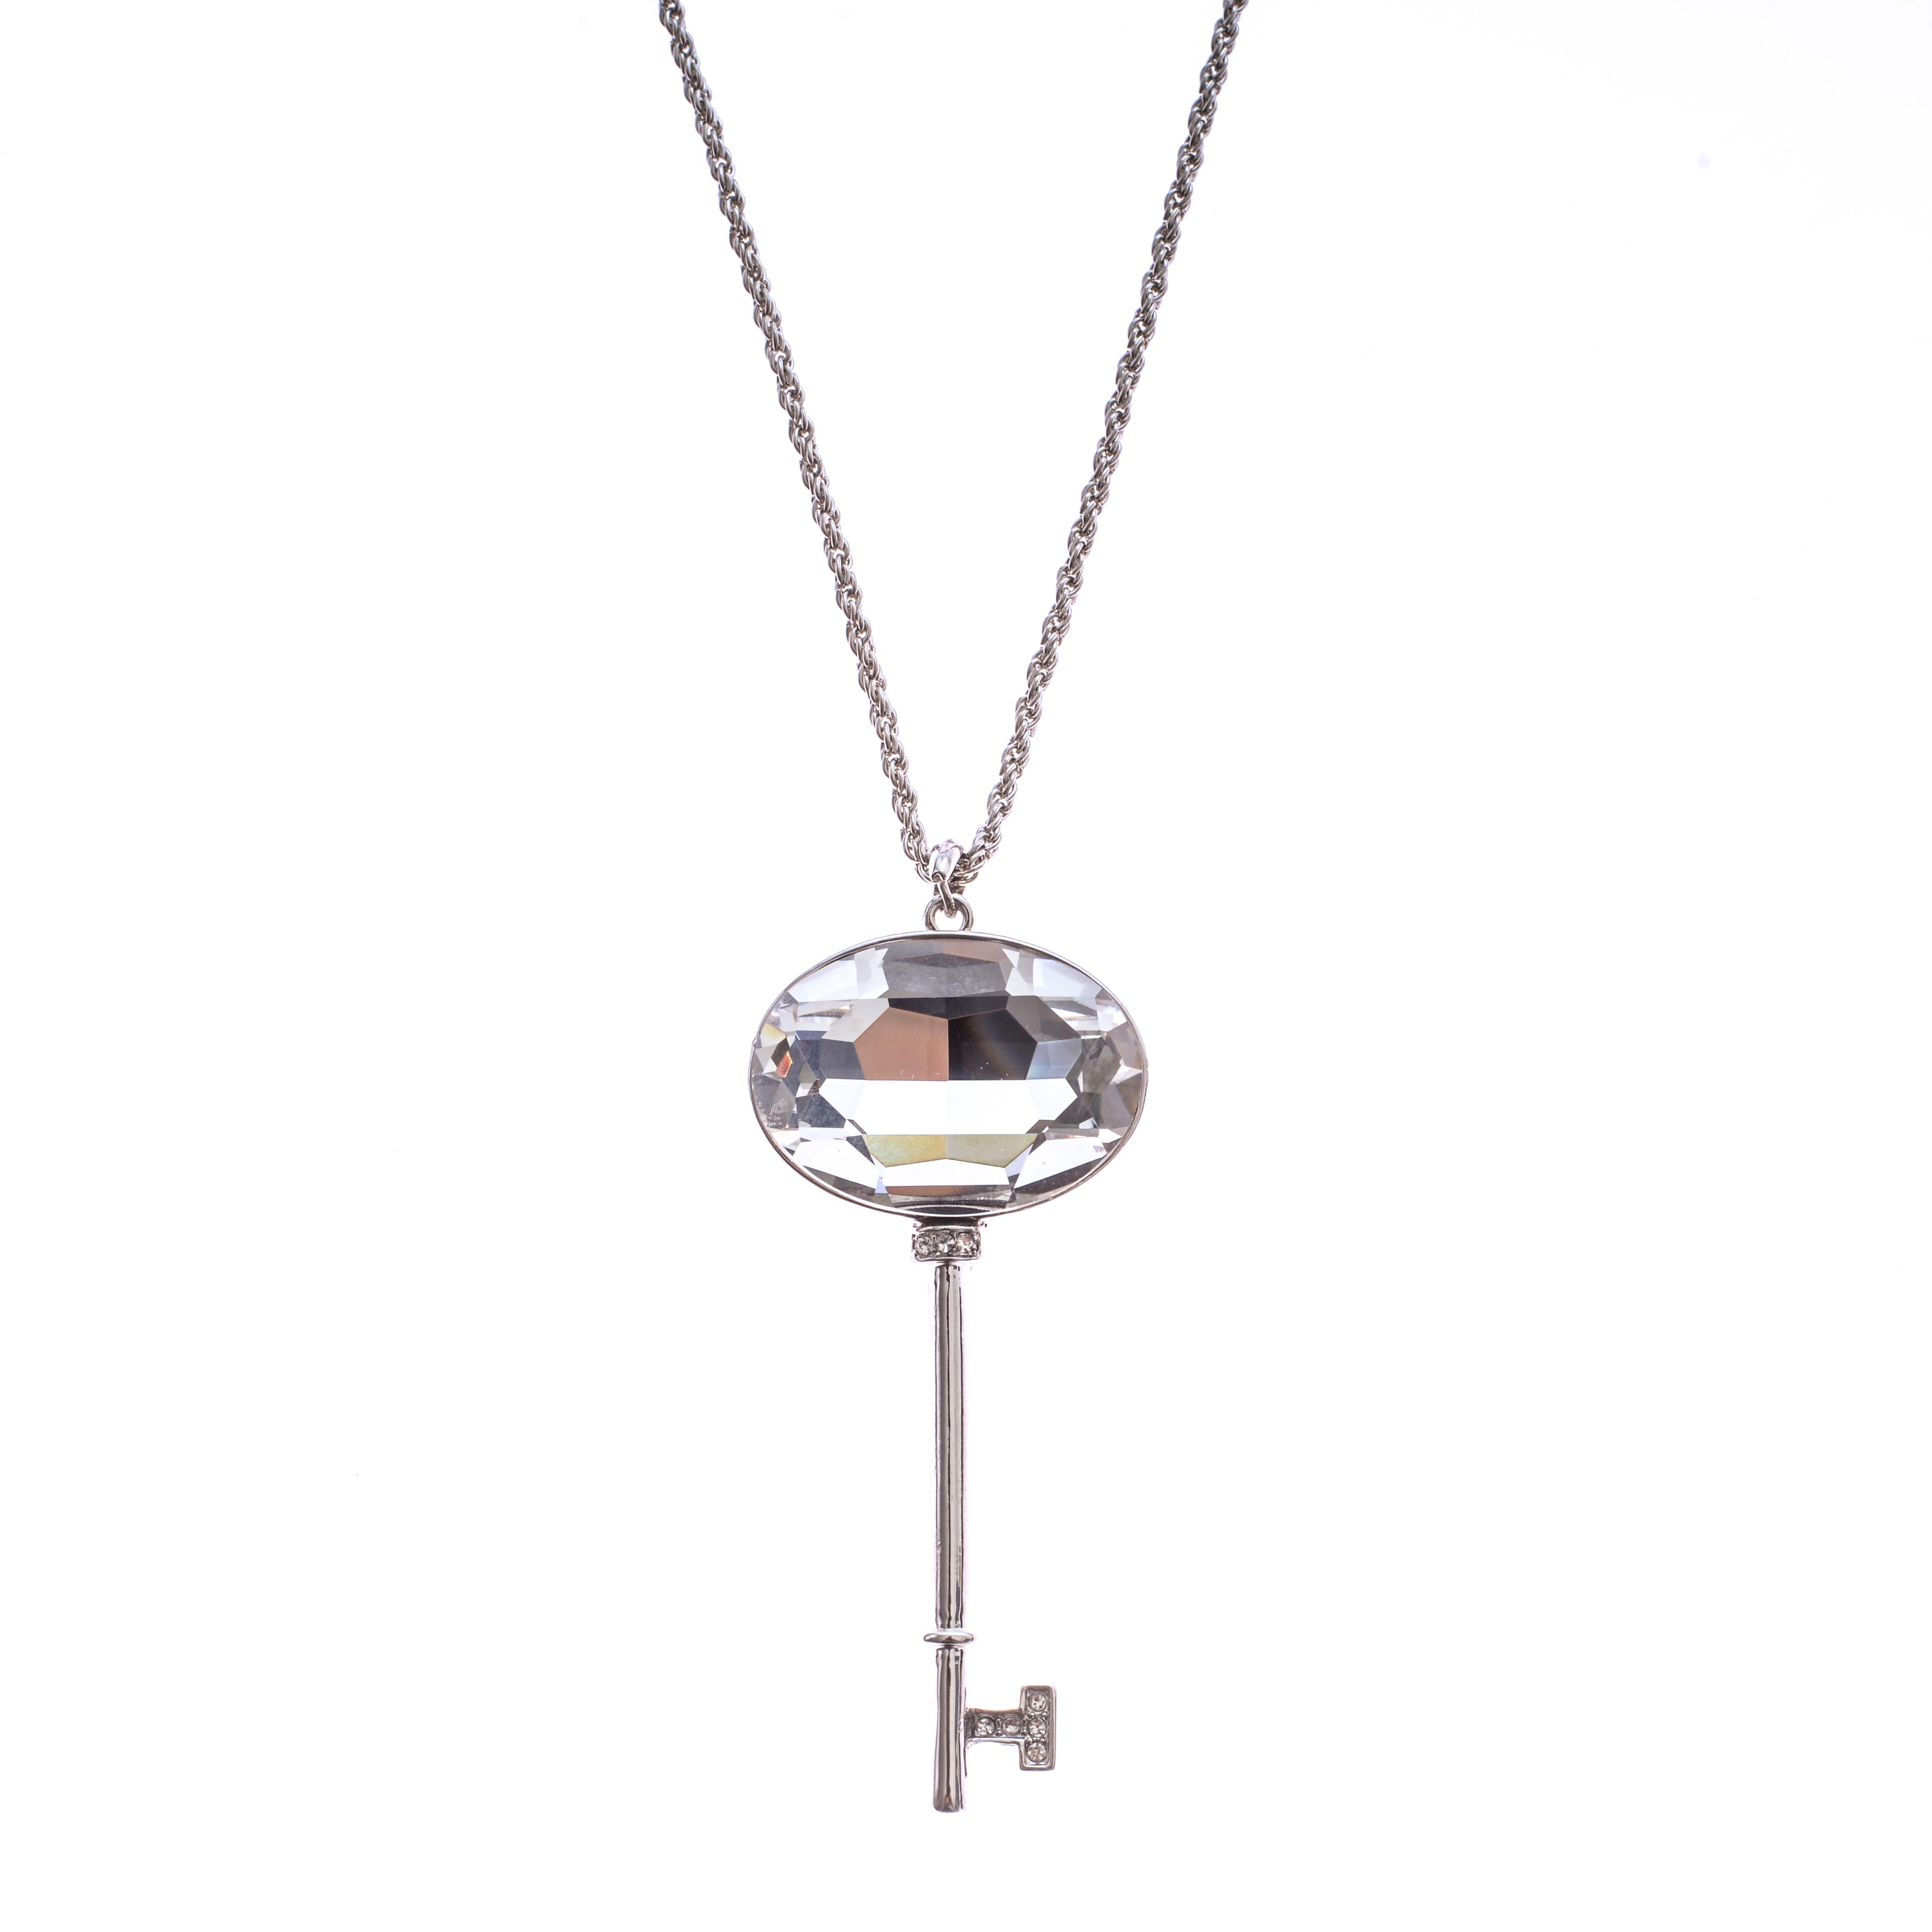 Lant Crystal Key